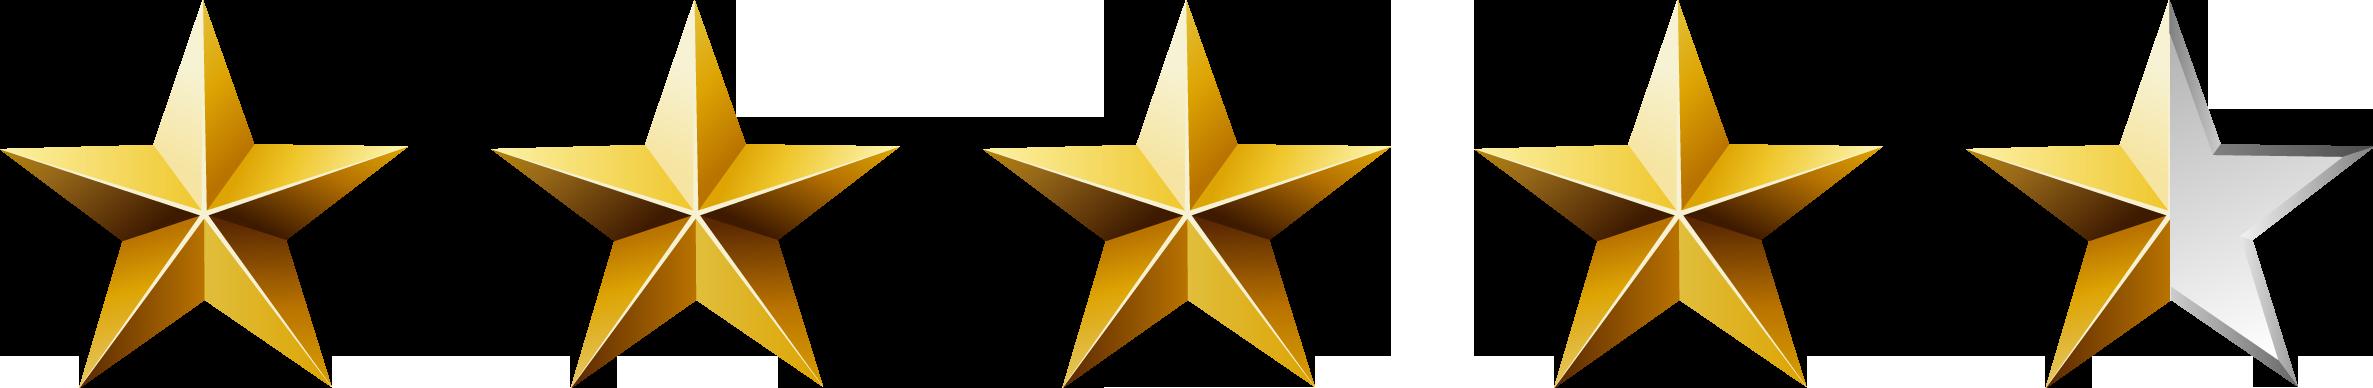 4.5 - 5 Stars